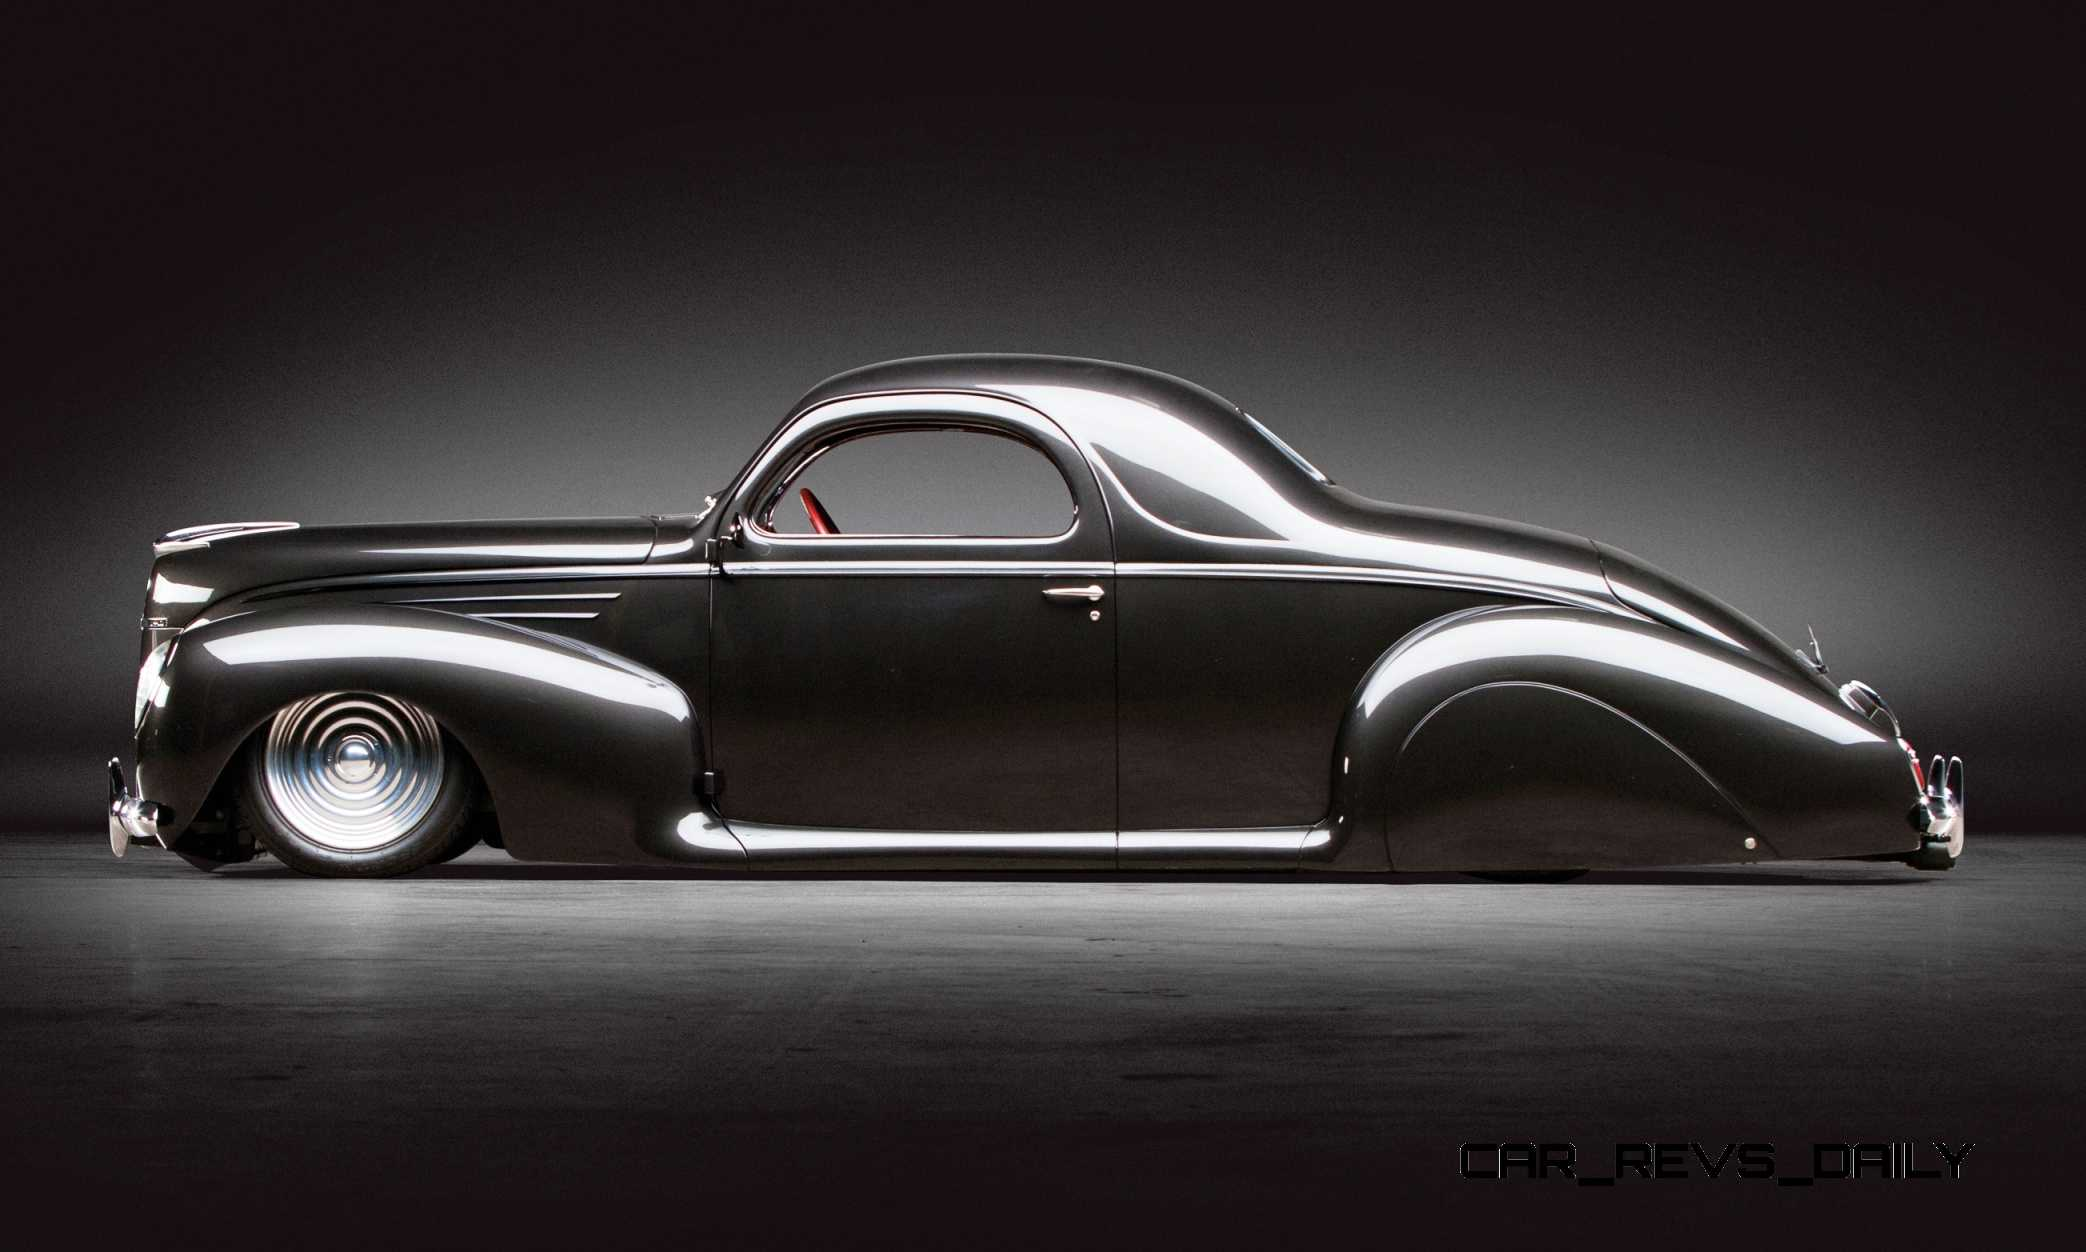 Car Show Dallas >> RM Dallas Preview - 600HP V12 1939 Lincoln Zephyr Coupe